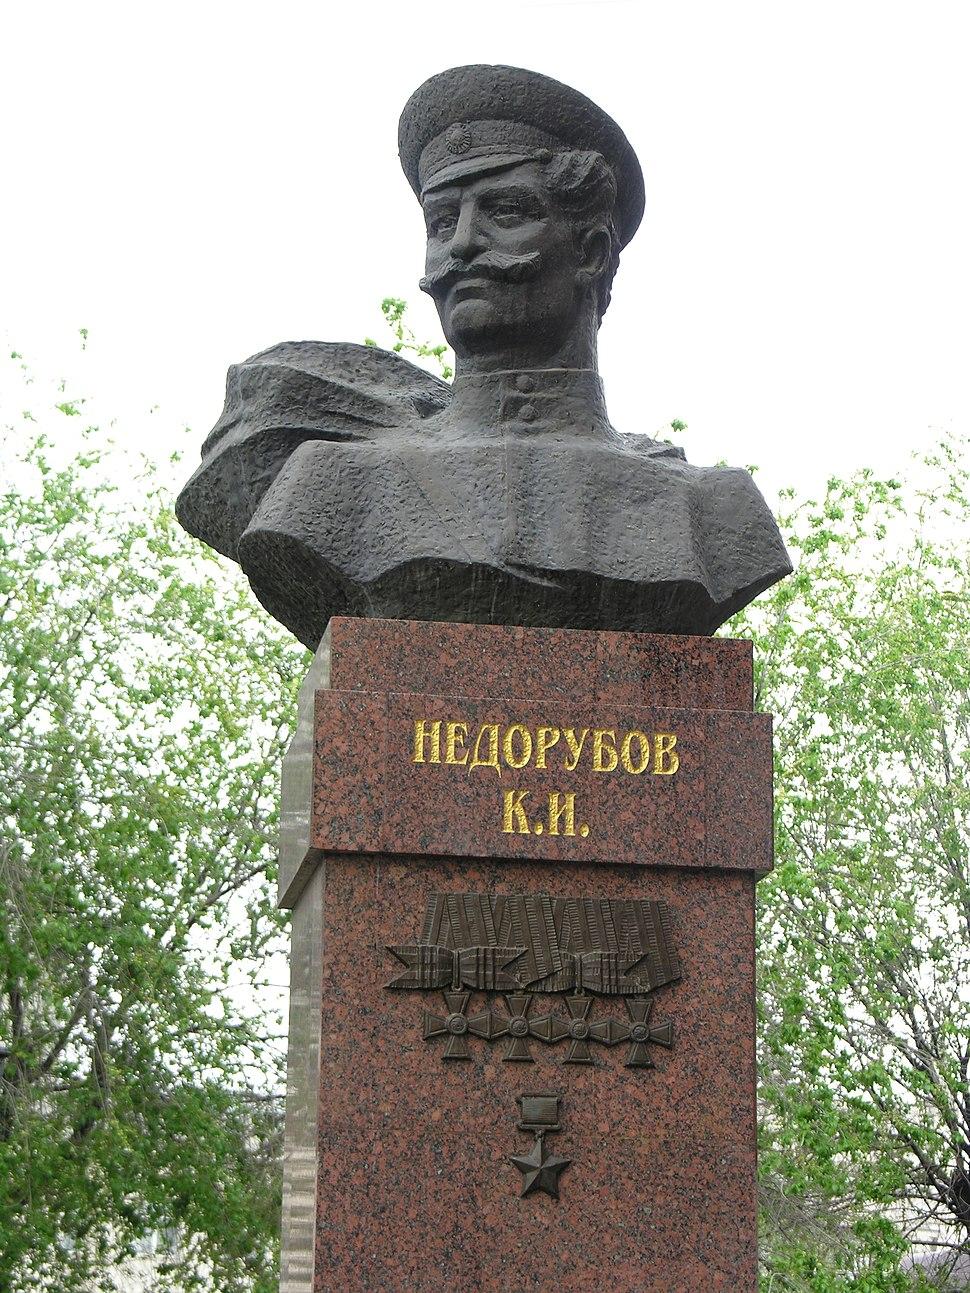 Konstantin Nedorubov (monument in Volgograd)